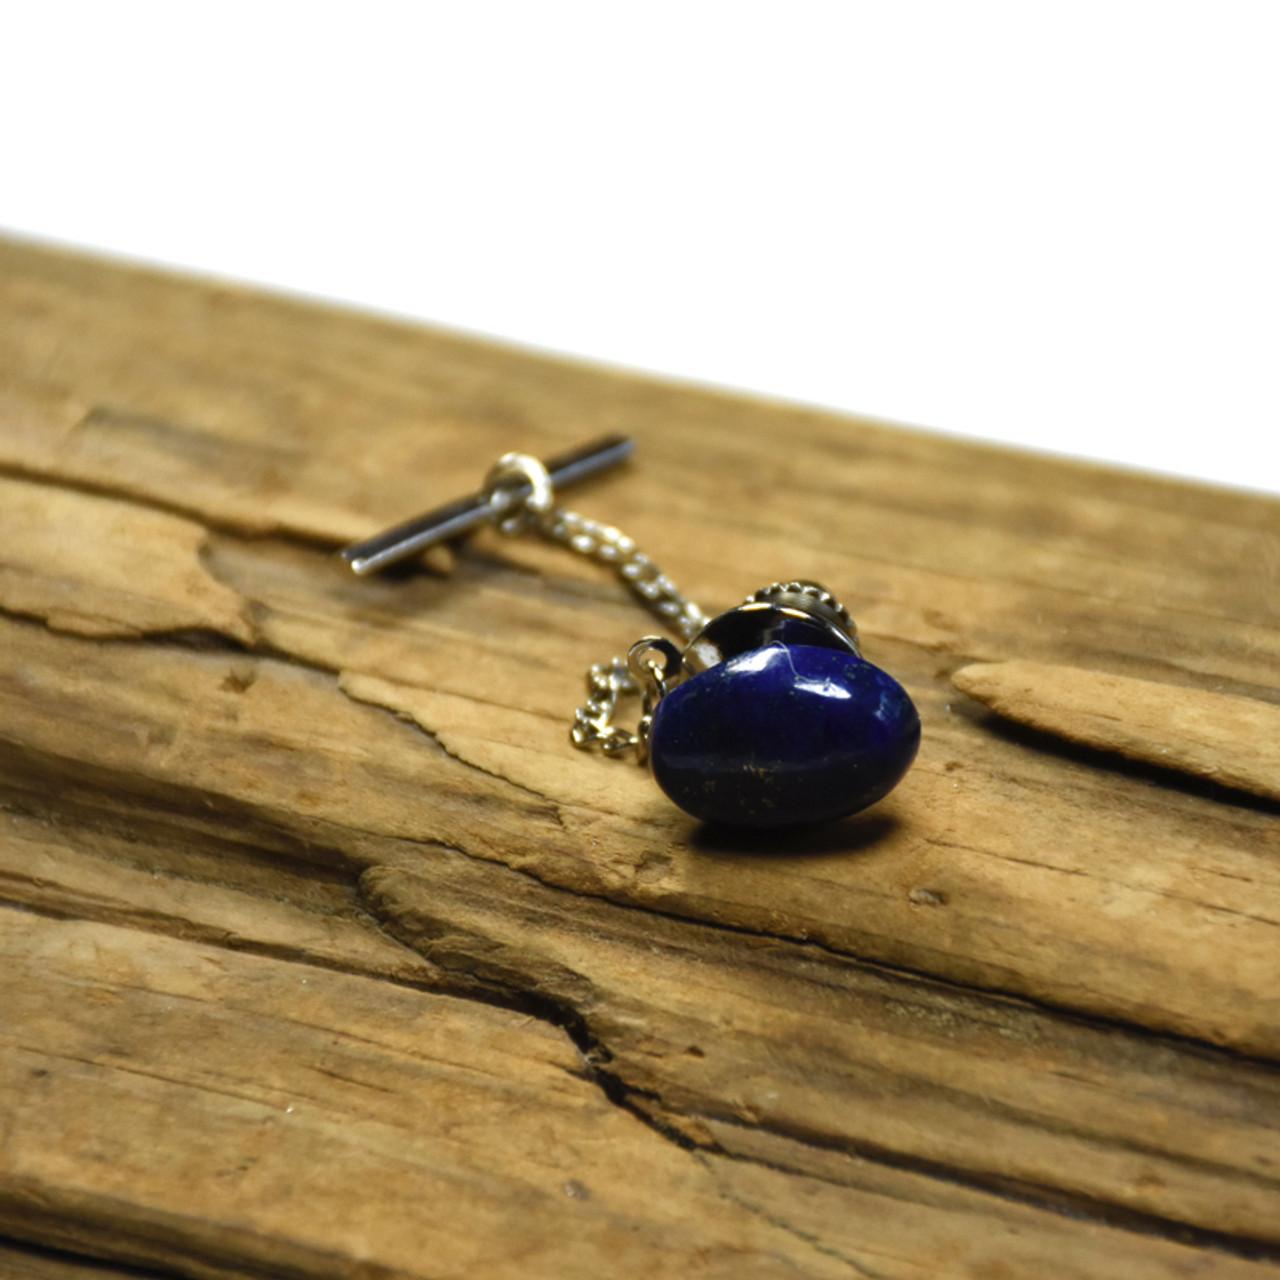 Lapis Lazuli Cabochon Stone Tie Tack Handmade - Quantity of 1 - Made to Order